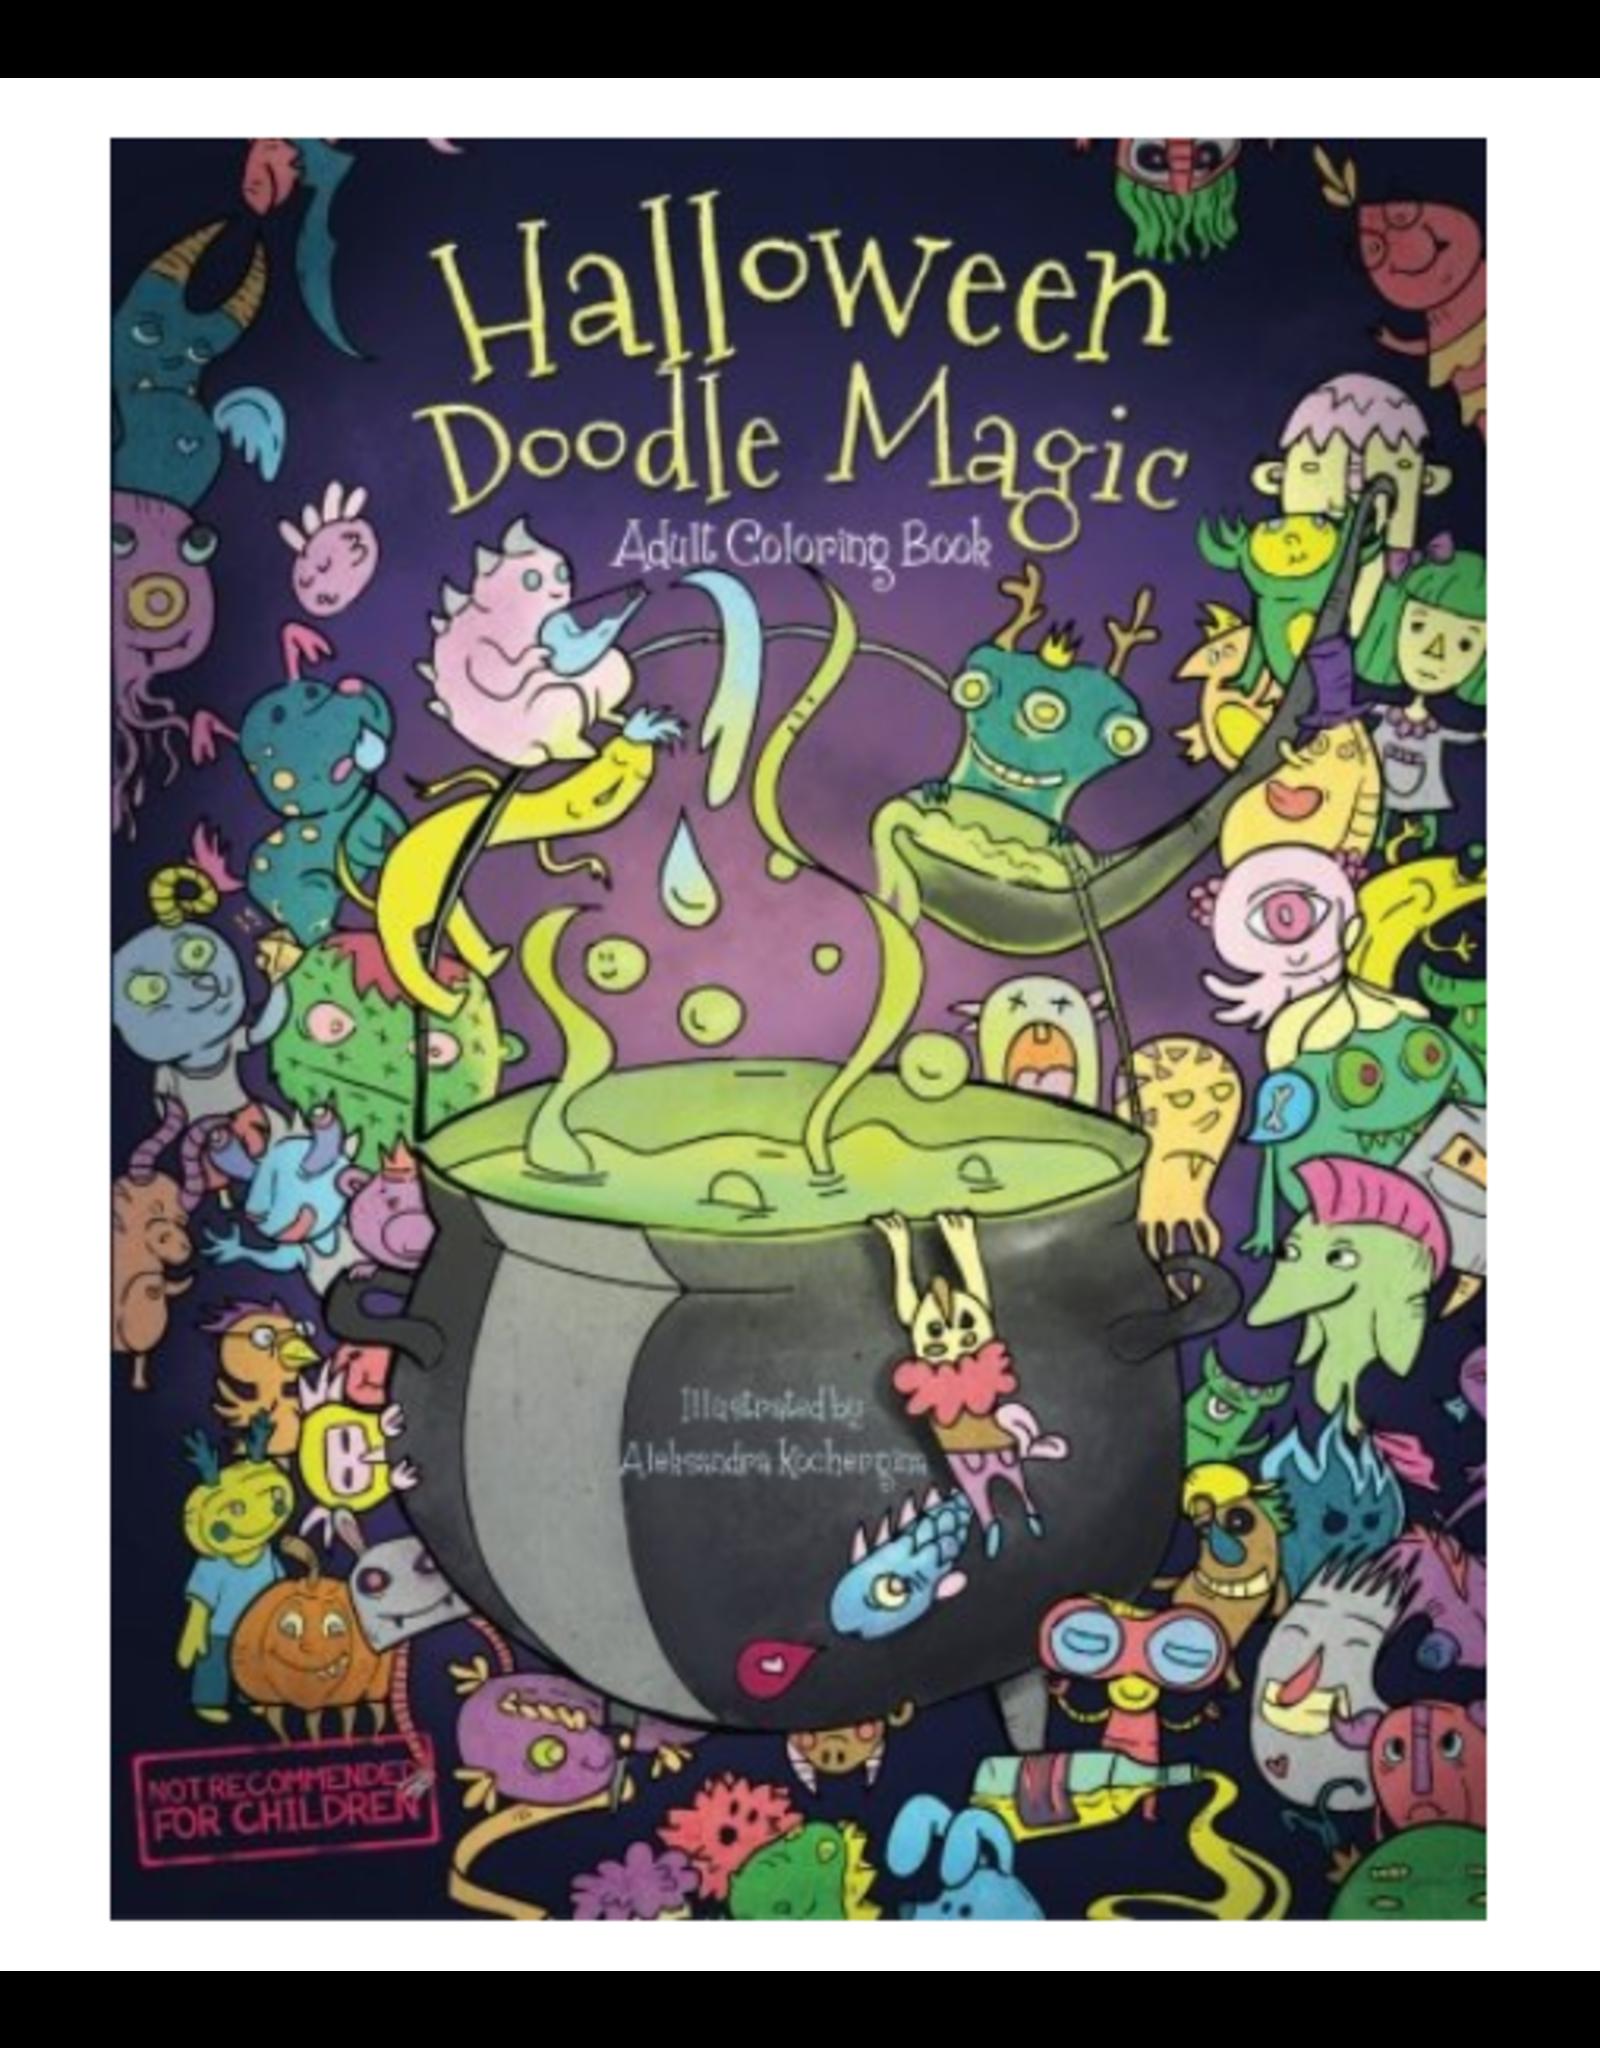 Okami Books Colouring Book for Adults, Halloween Doodle Magic